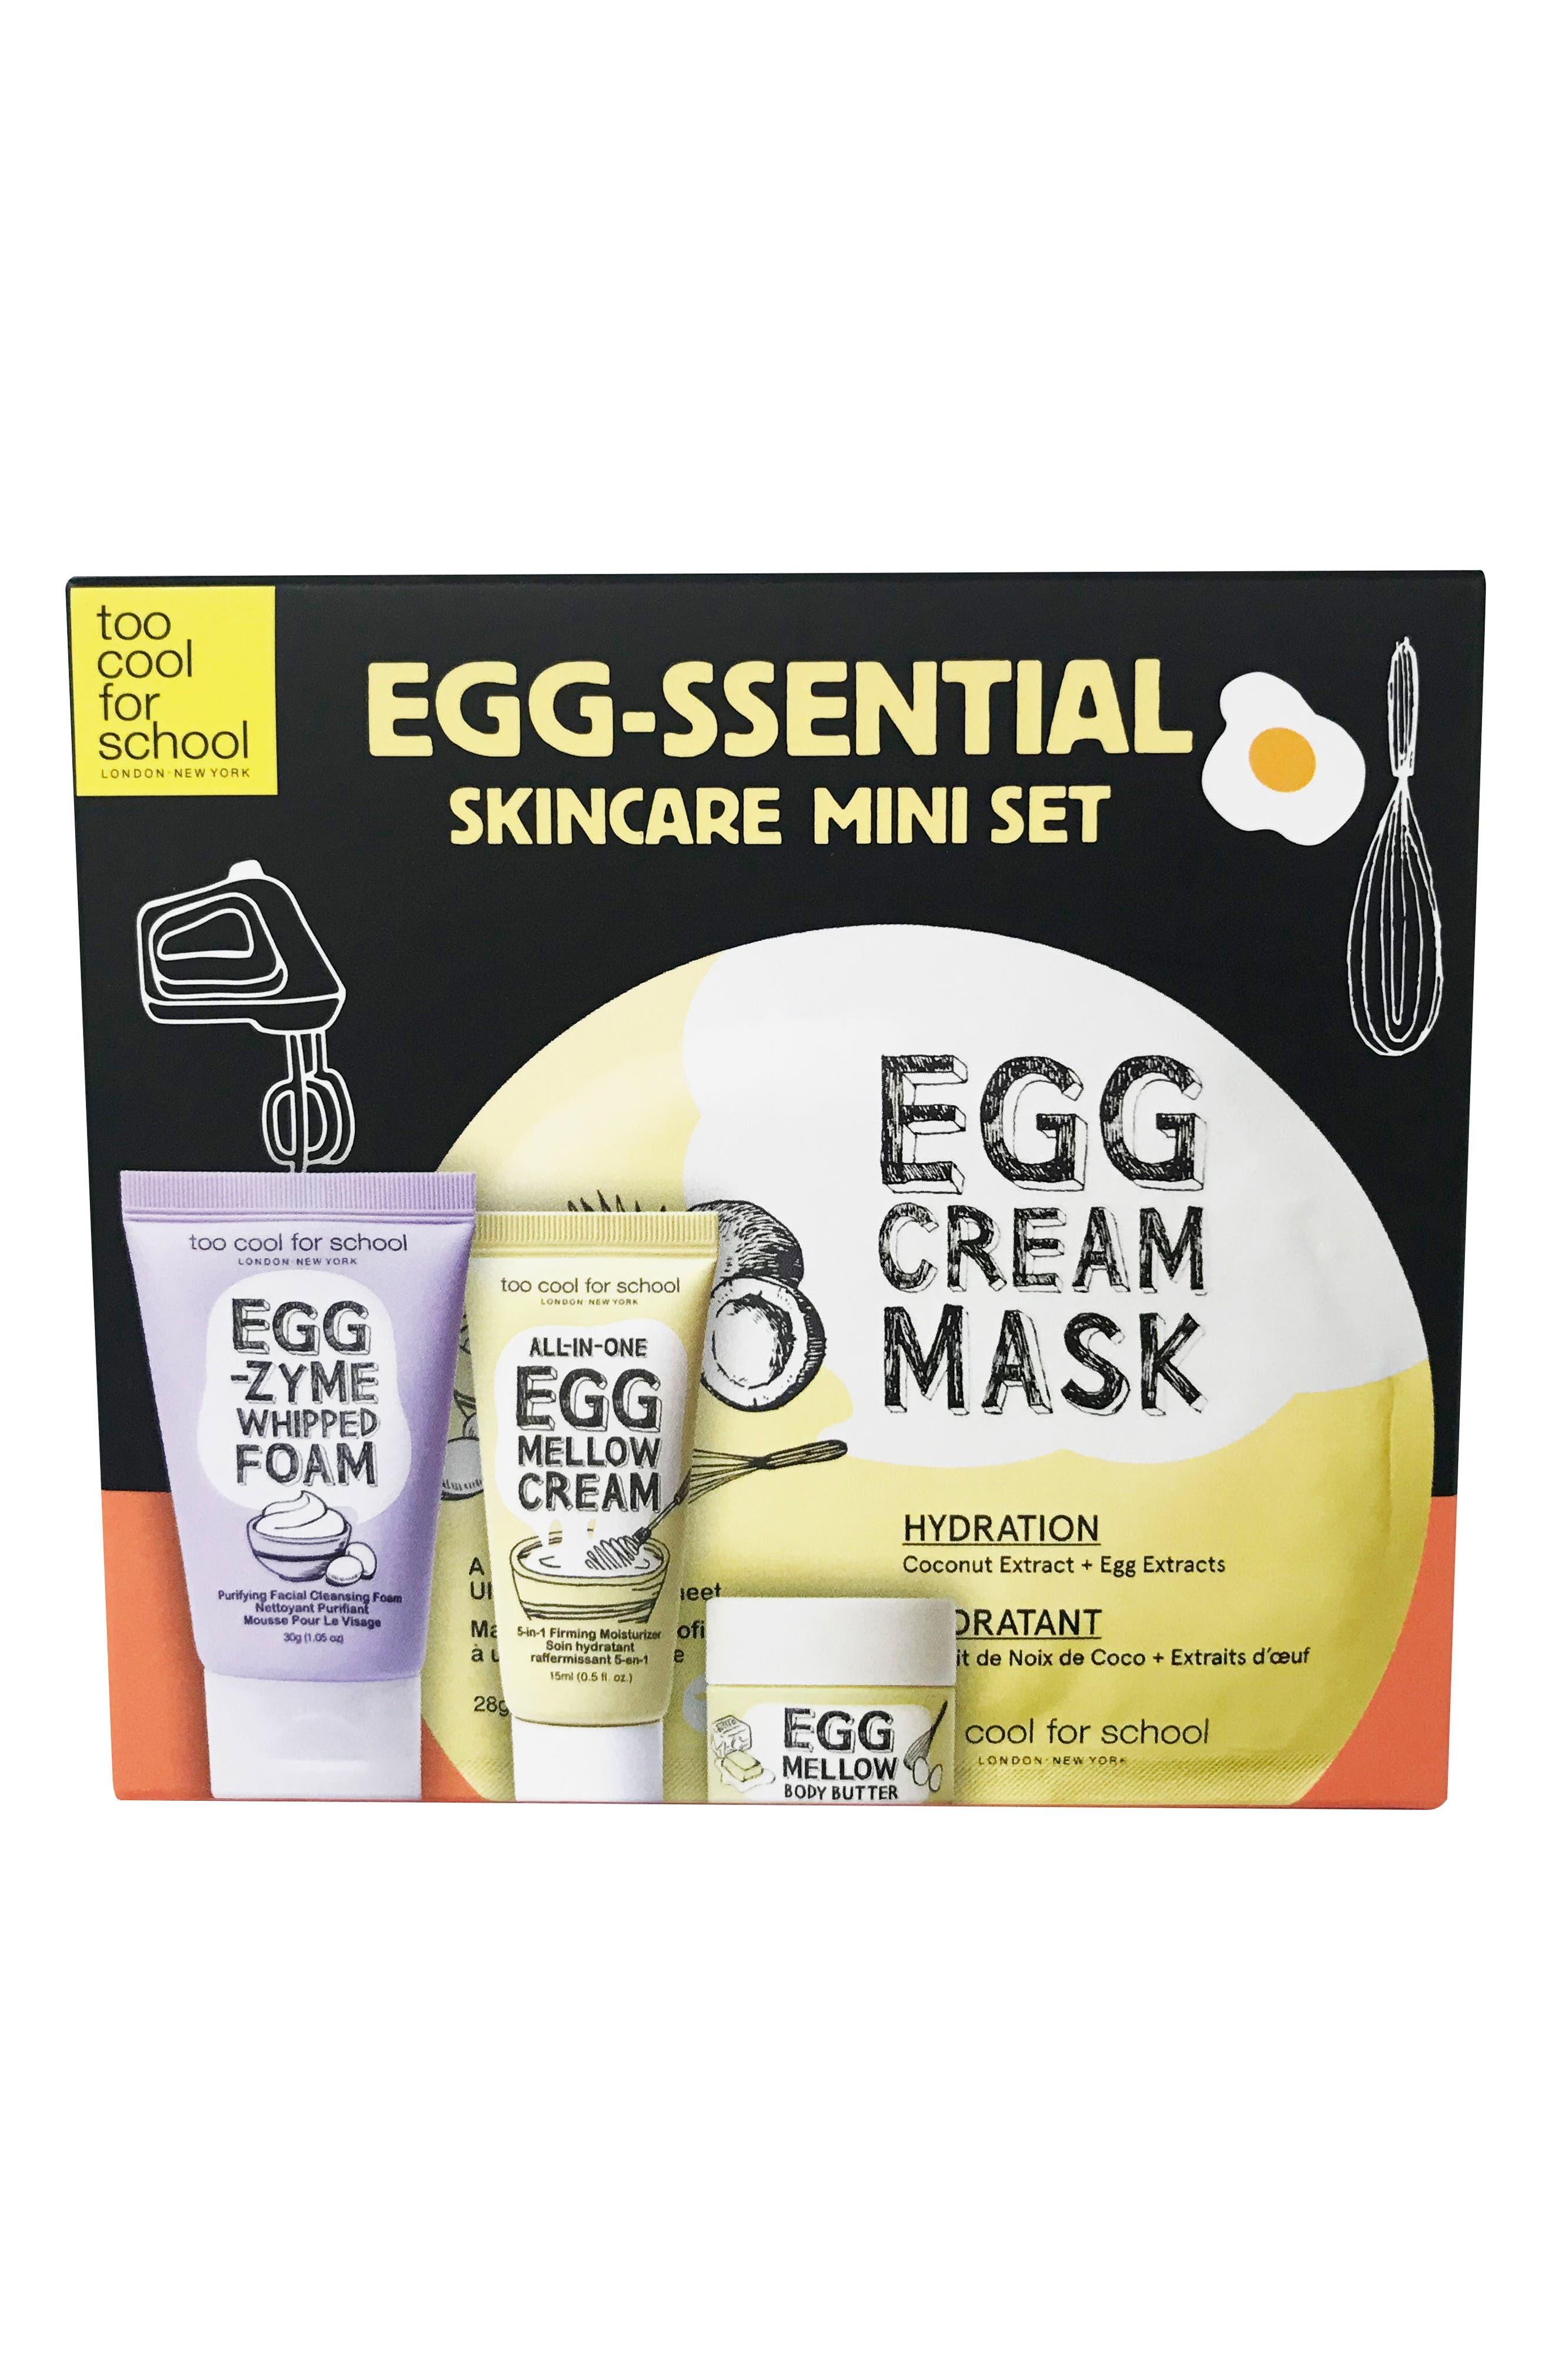 Egg-Ssential Skin Care Mini Set,                             Main thumbnail 1, color,                             000